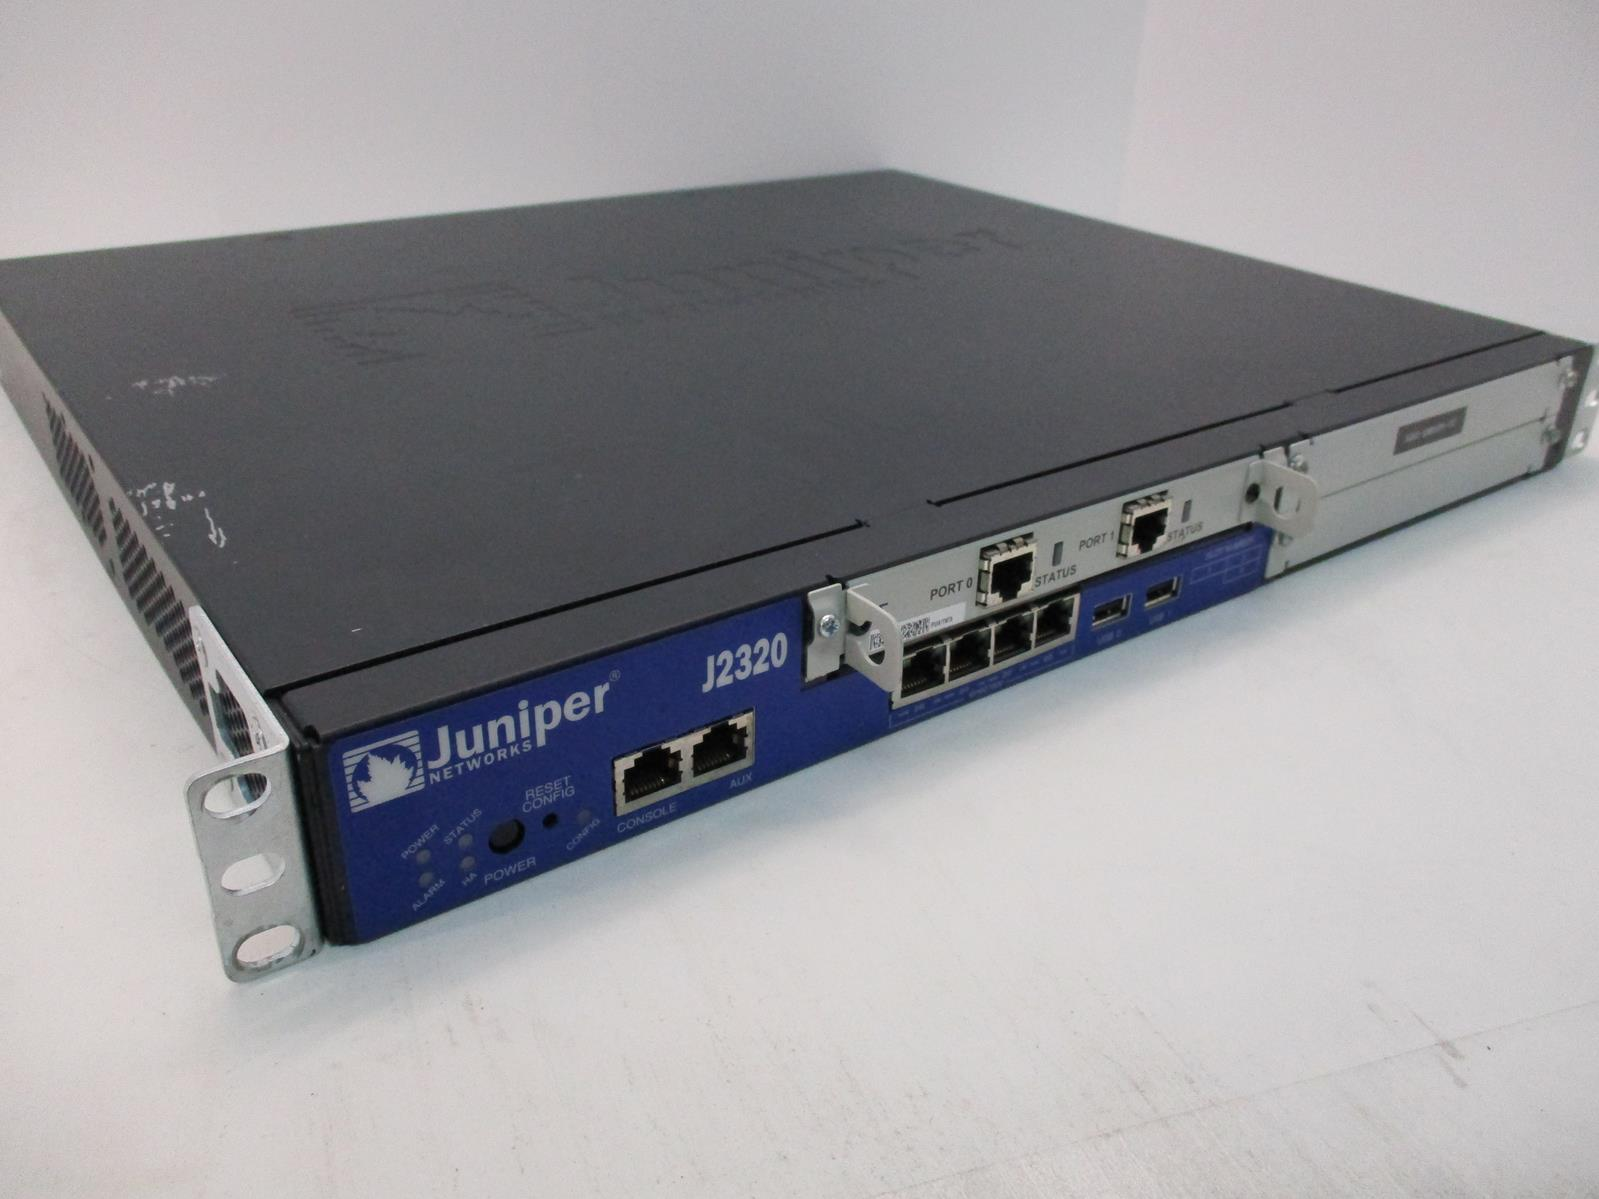 Juniper Networks J2320 400 Mbps 4-Port Gigabit Wired Router | eBay